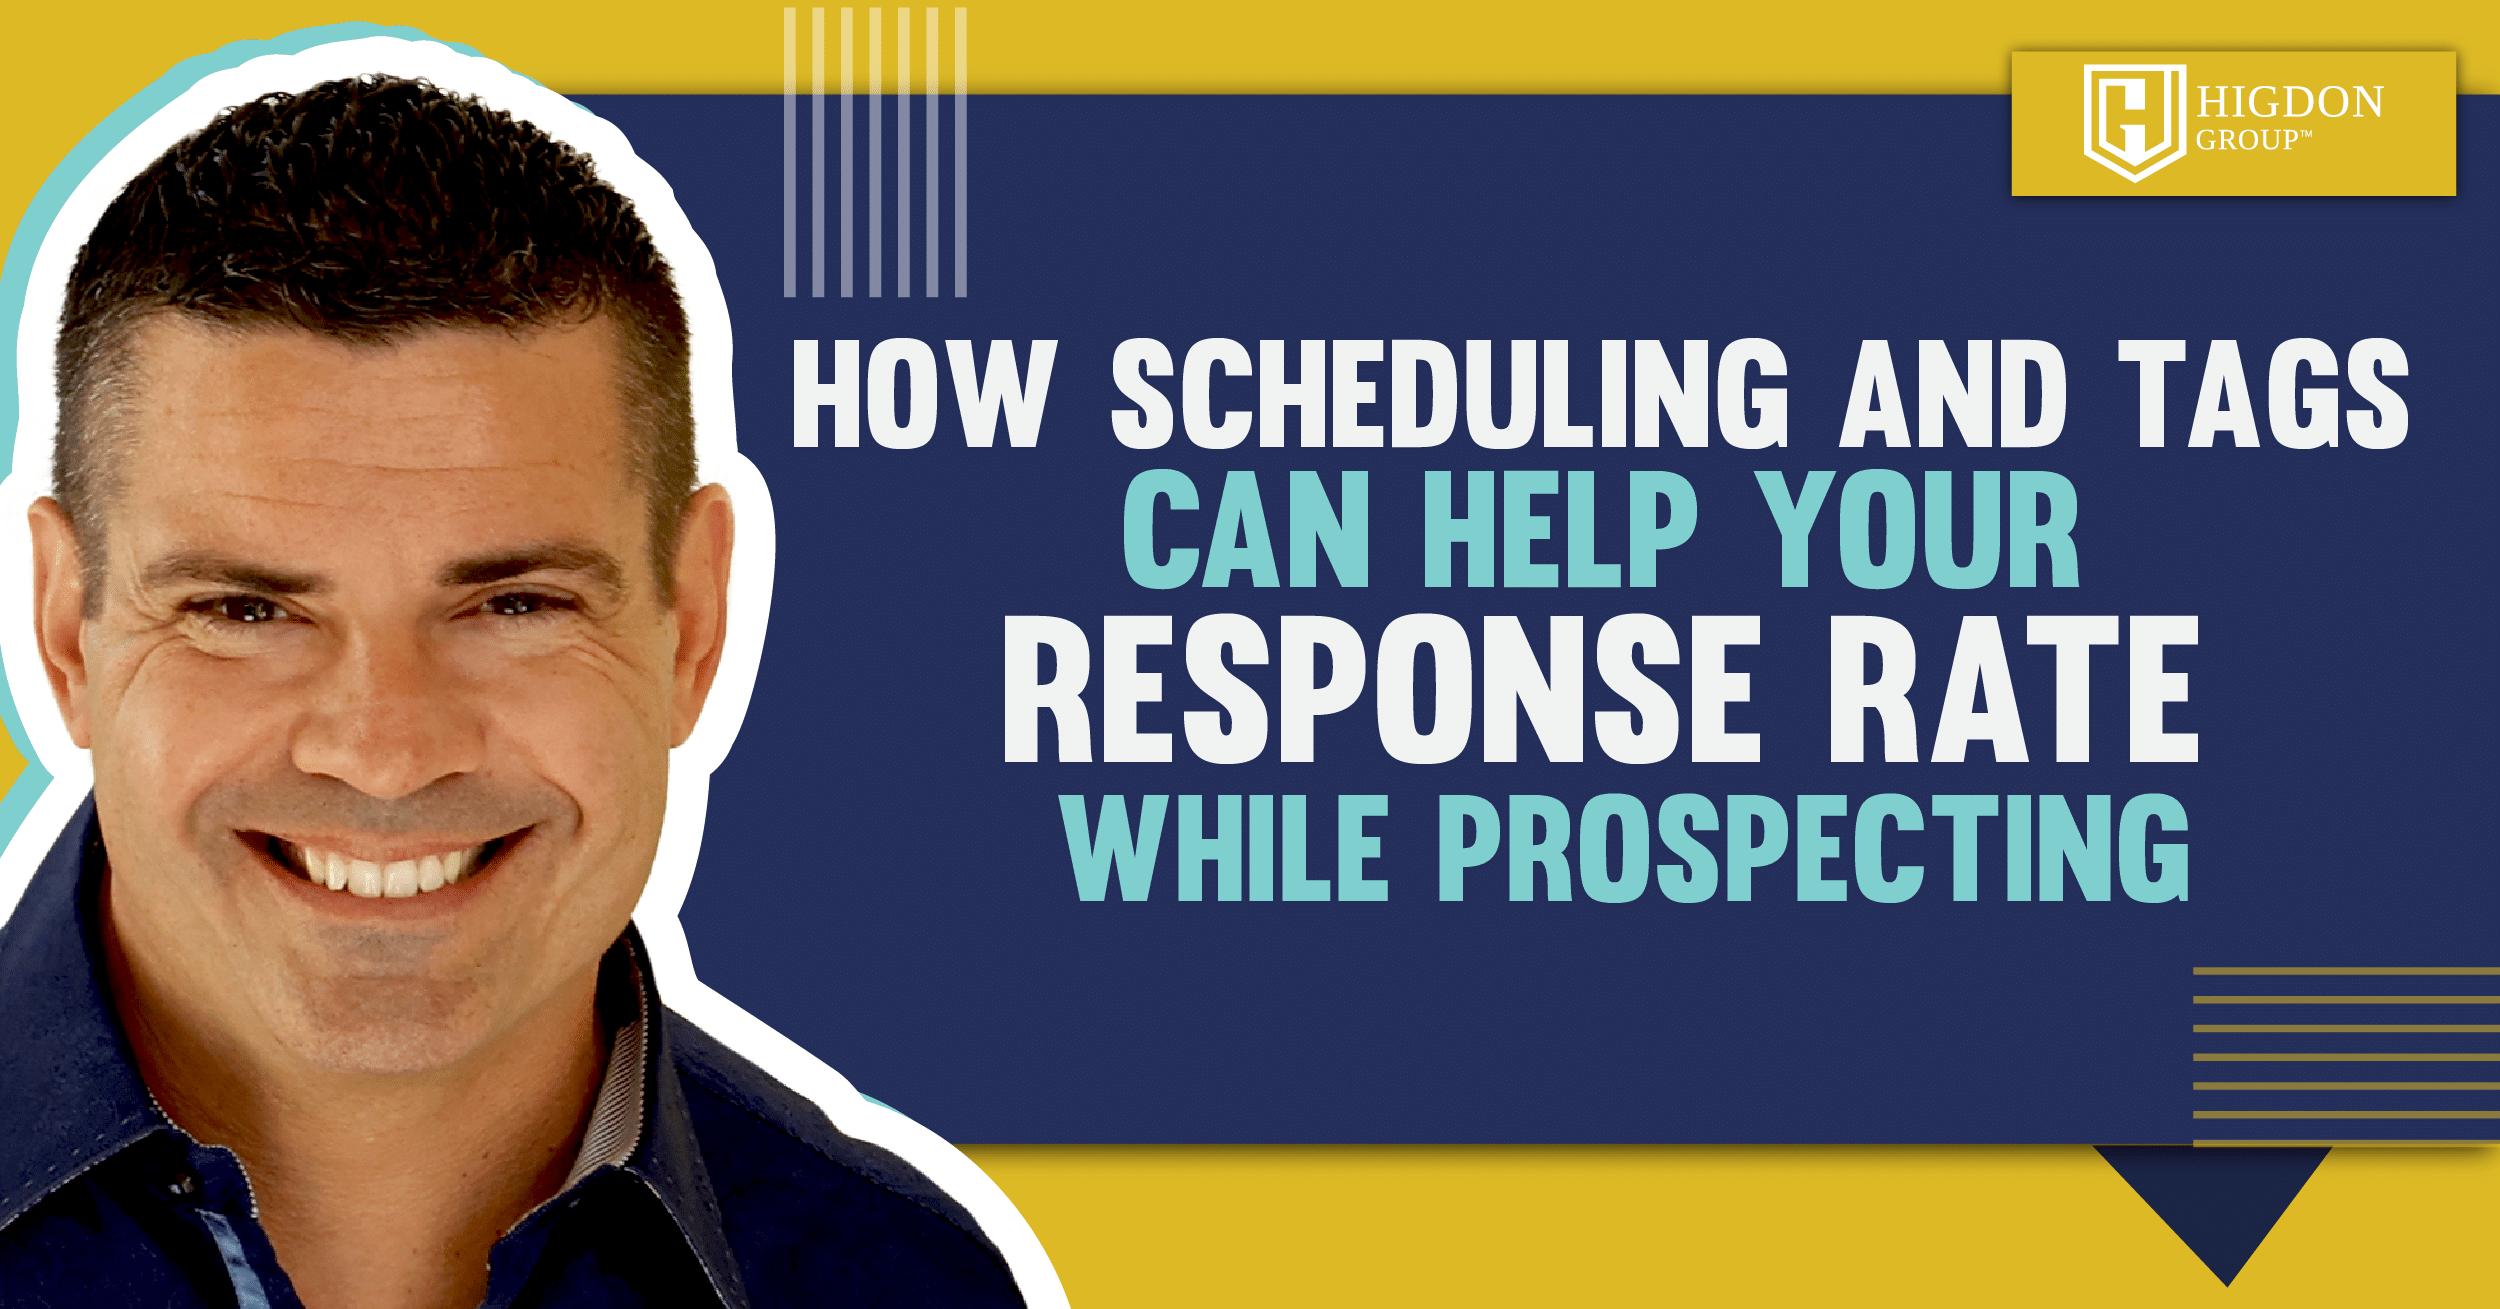 prospecting response rate